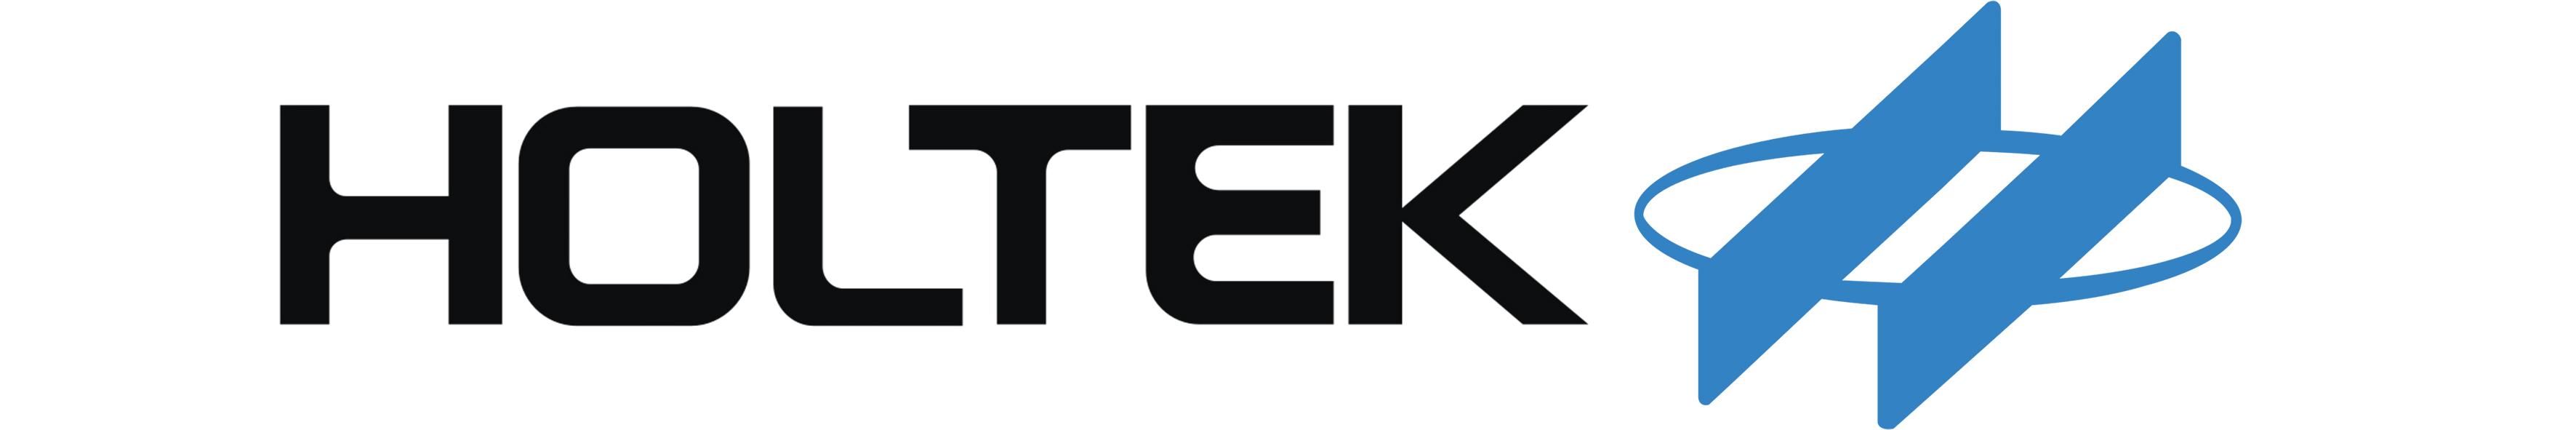 Holtek Product / میکرو مدرن نمایندگی رسمی holtek در ایران